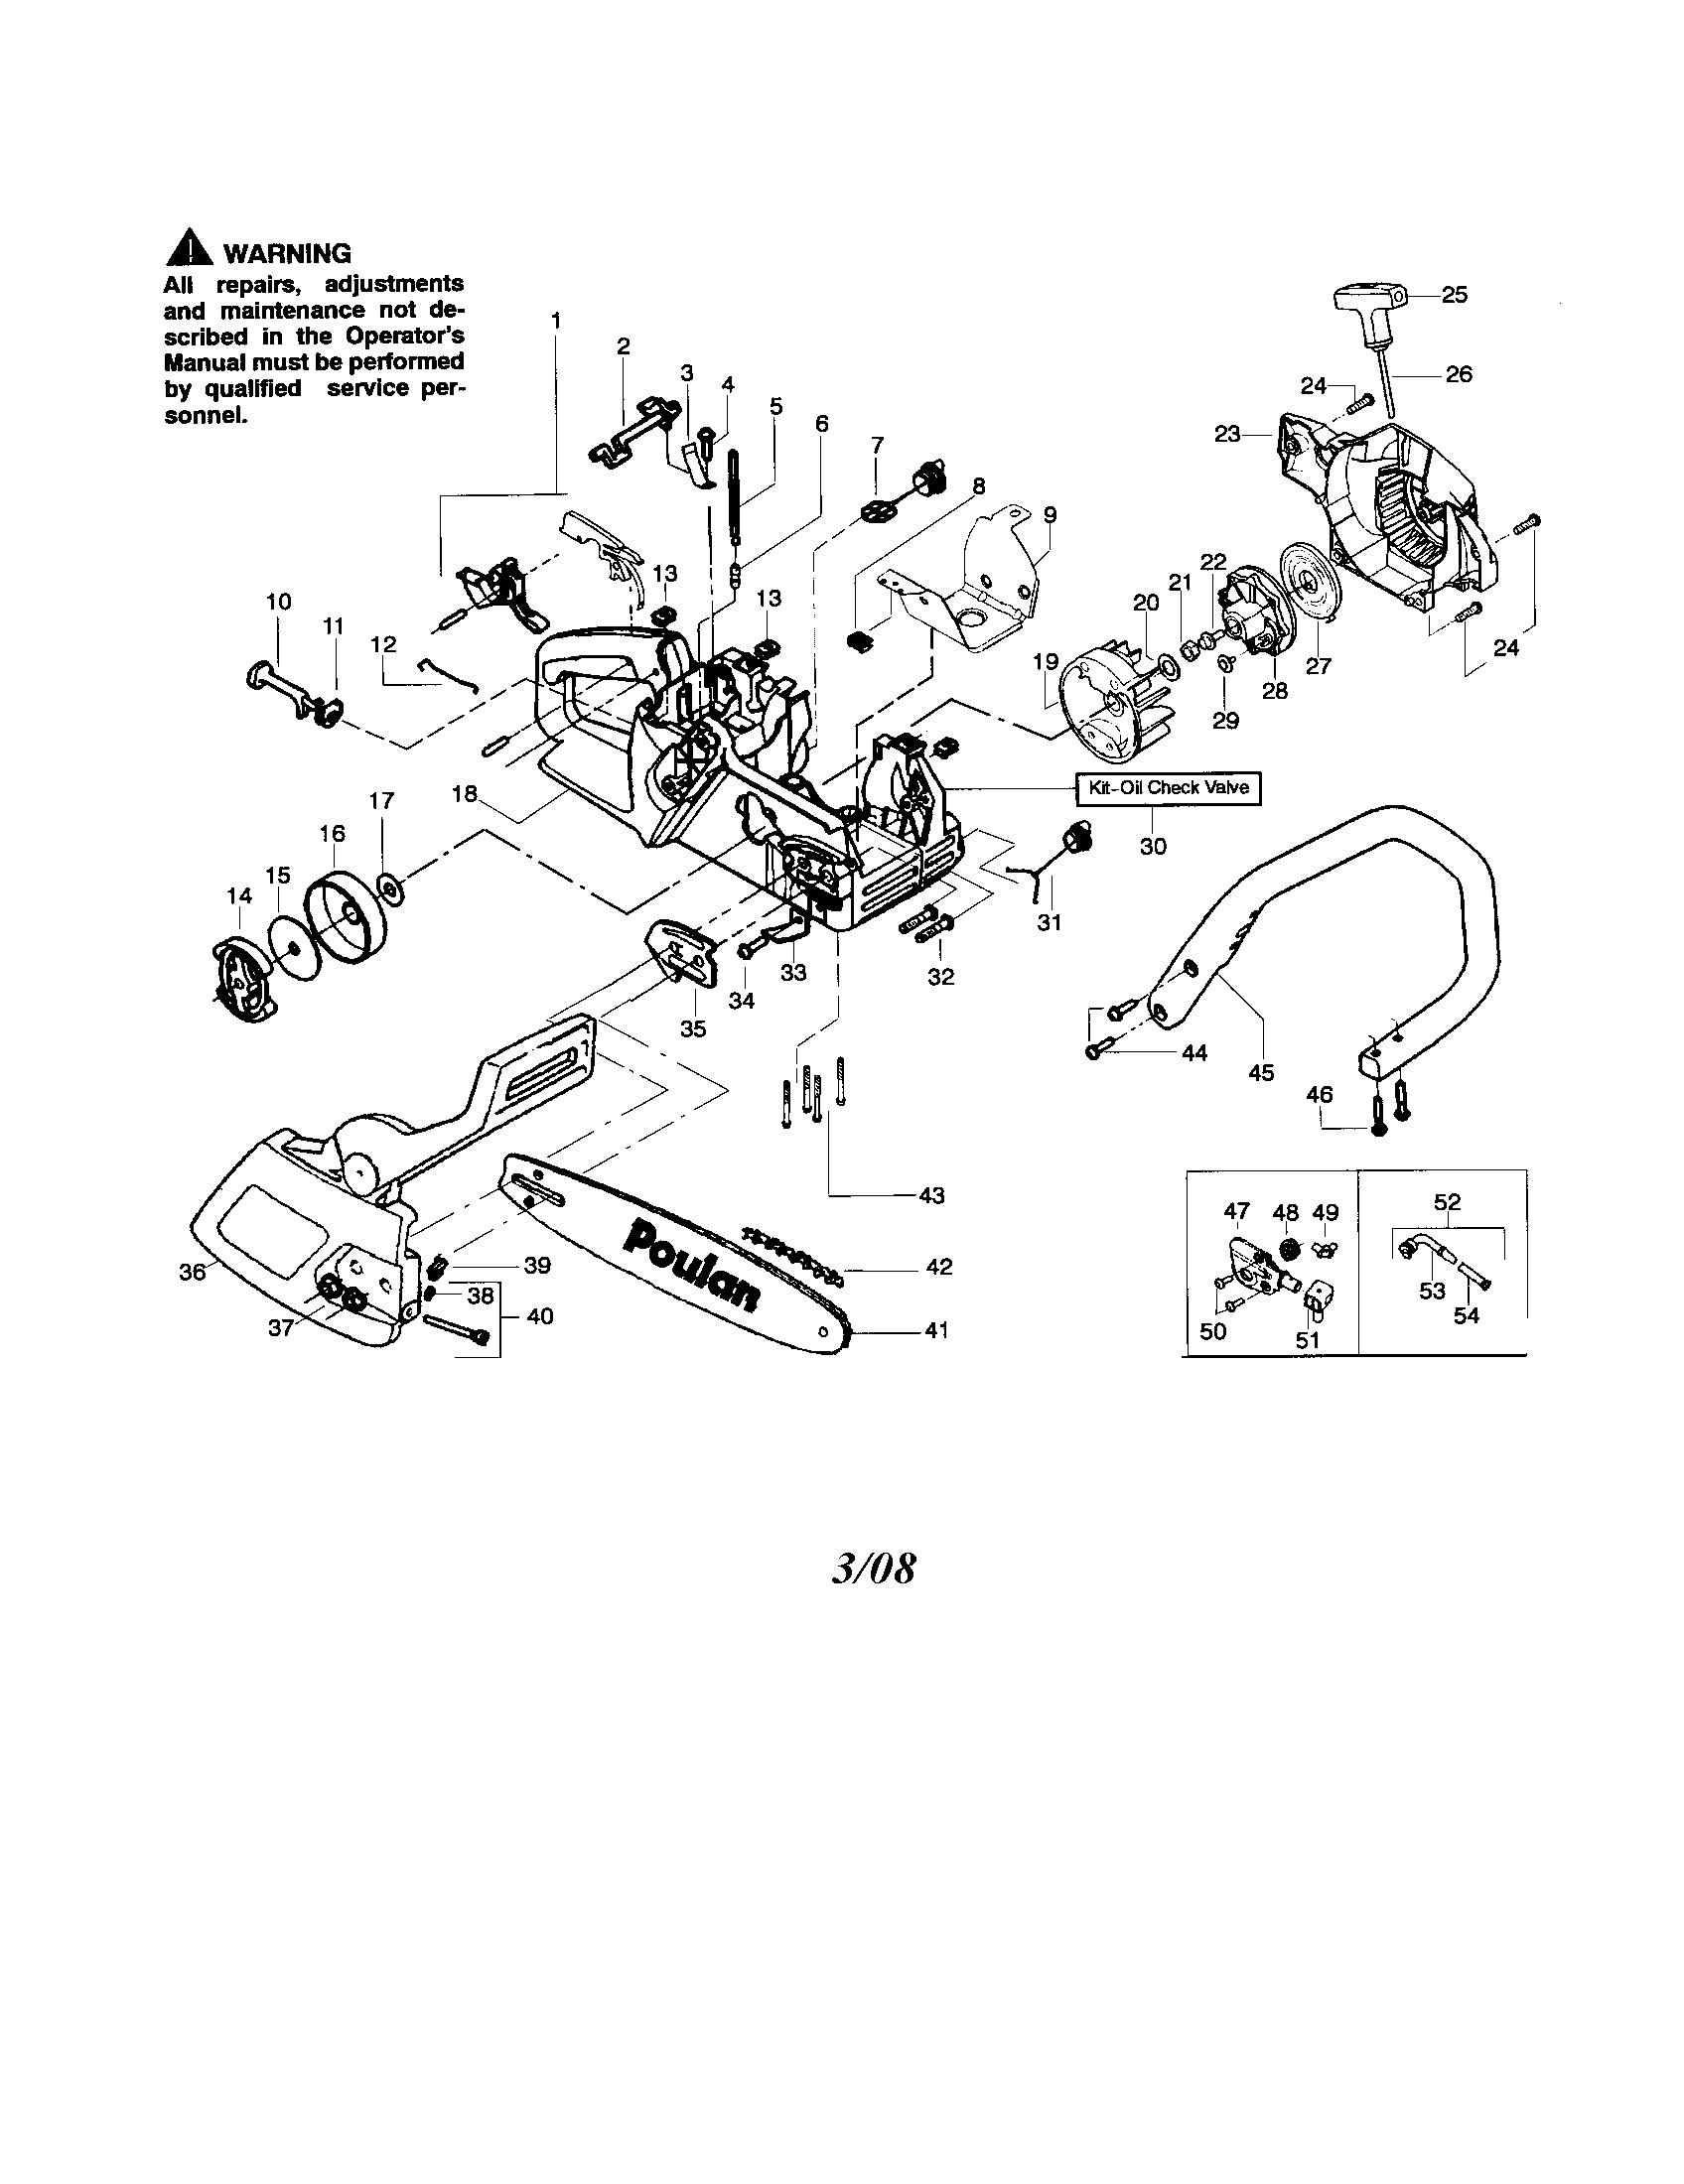 Poulan Chainsaw Fuel Line Diagram, Poulan, Free Engine